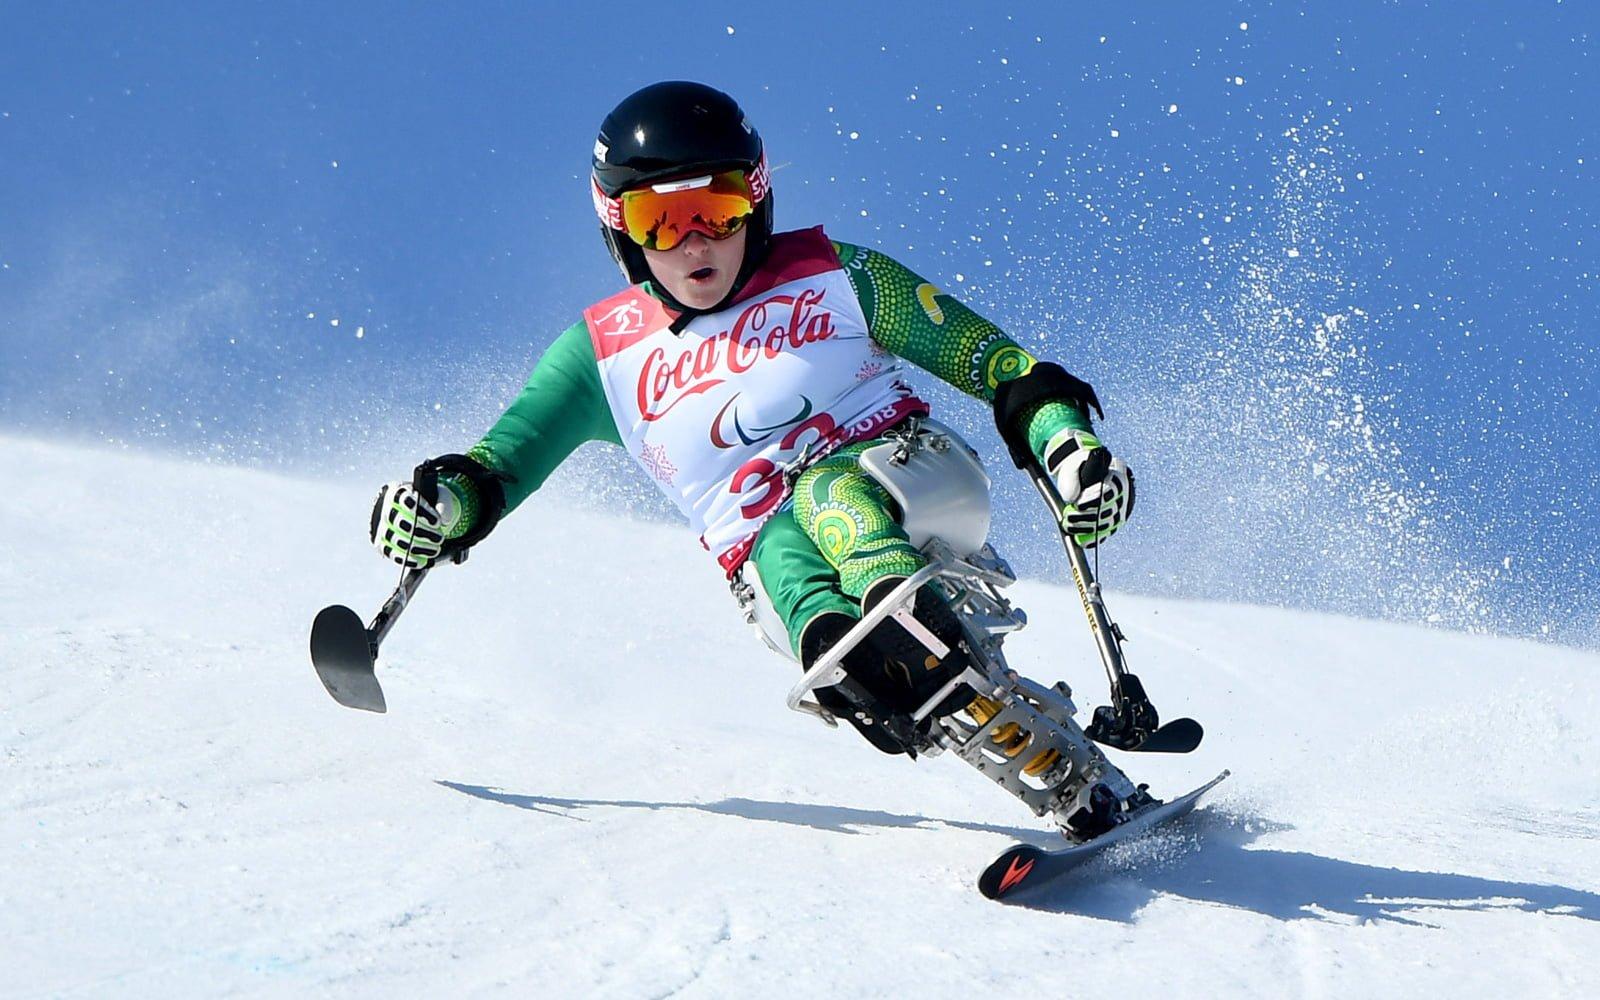 Dual Winter Paralympian Tori Pendergast Announces Retirement